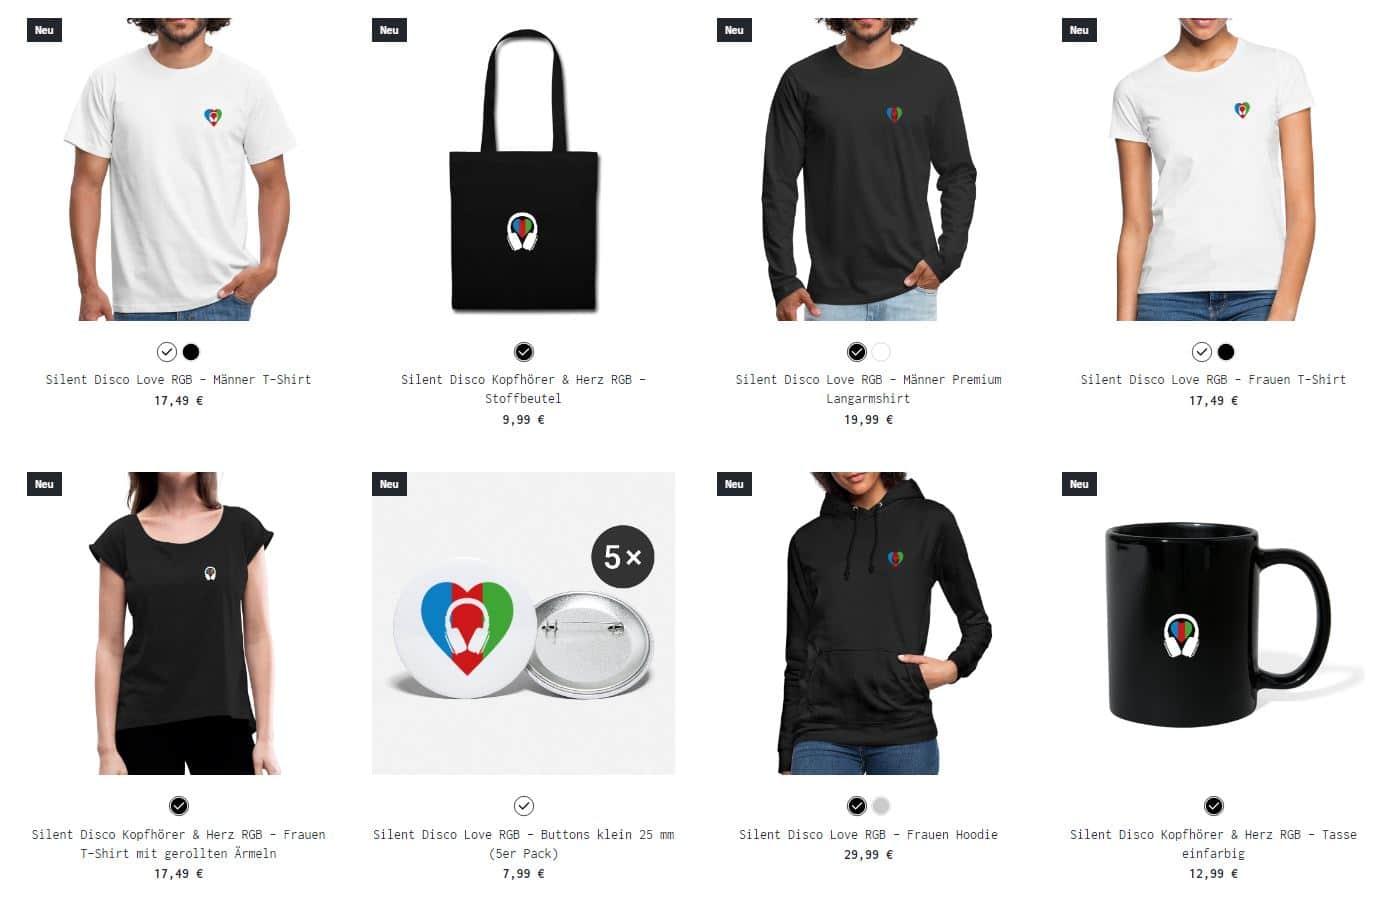 Silent Disco Fanshop Produkte